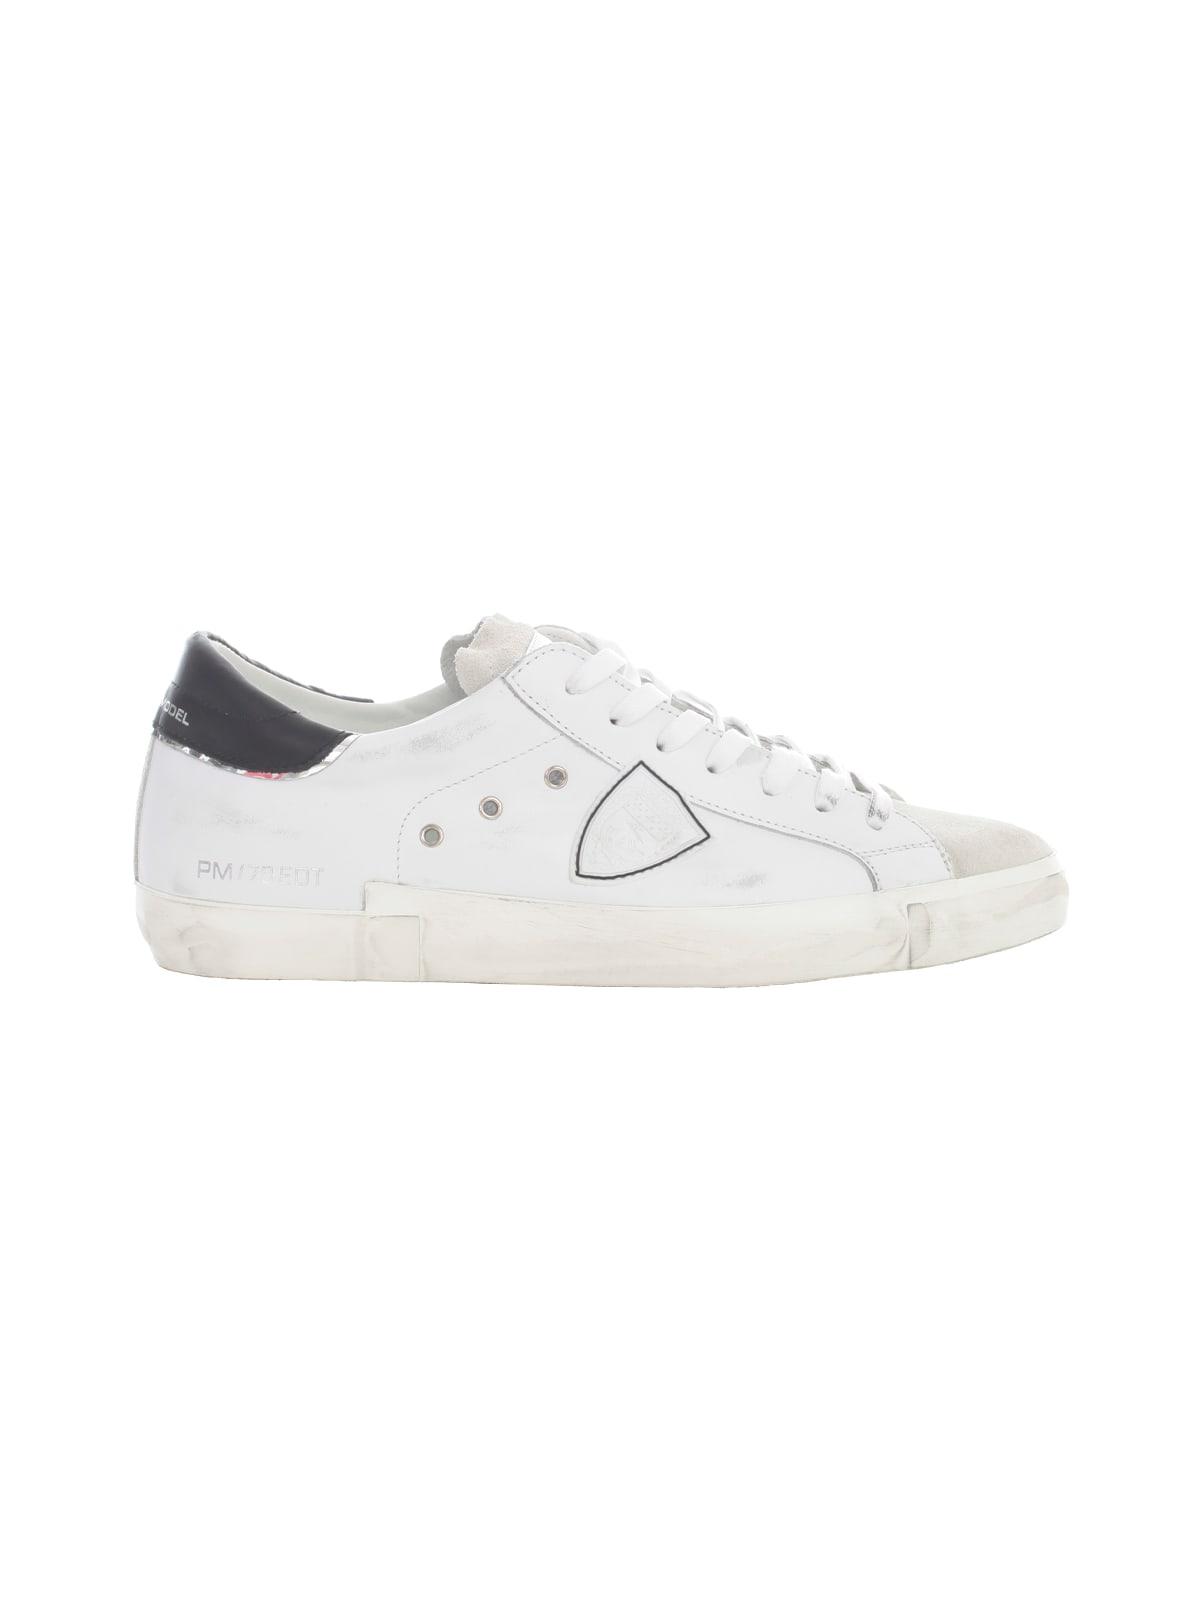 Philippe Model Low Sneakers Prsx W/ Black Heel